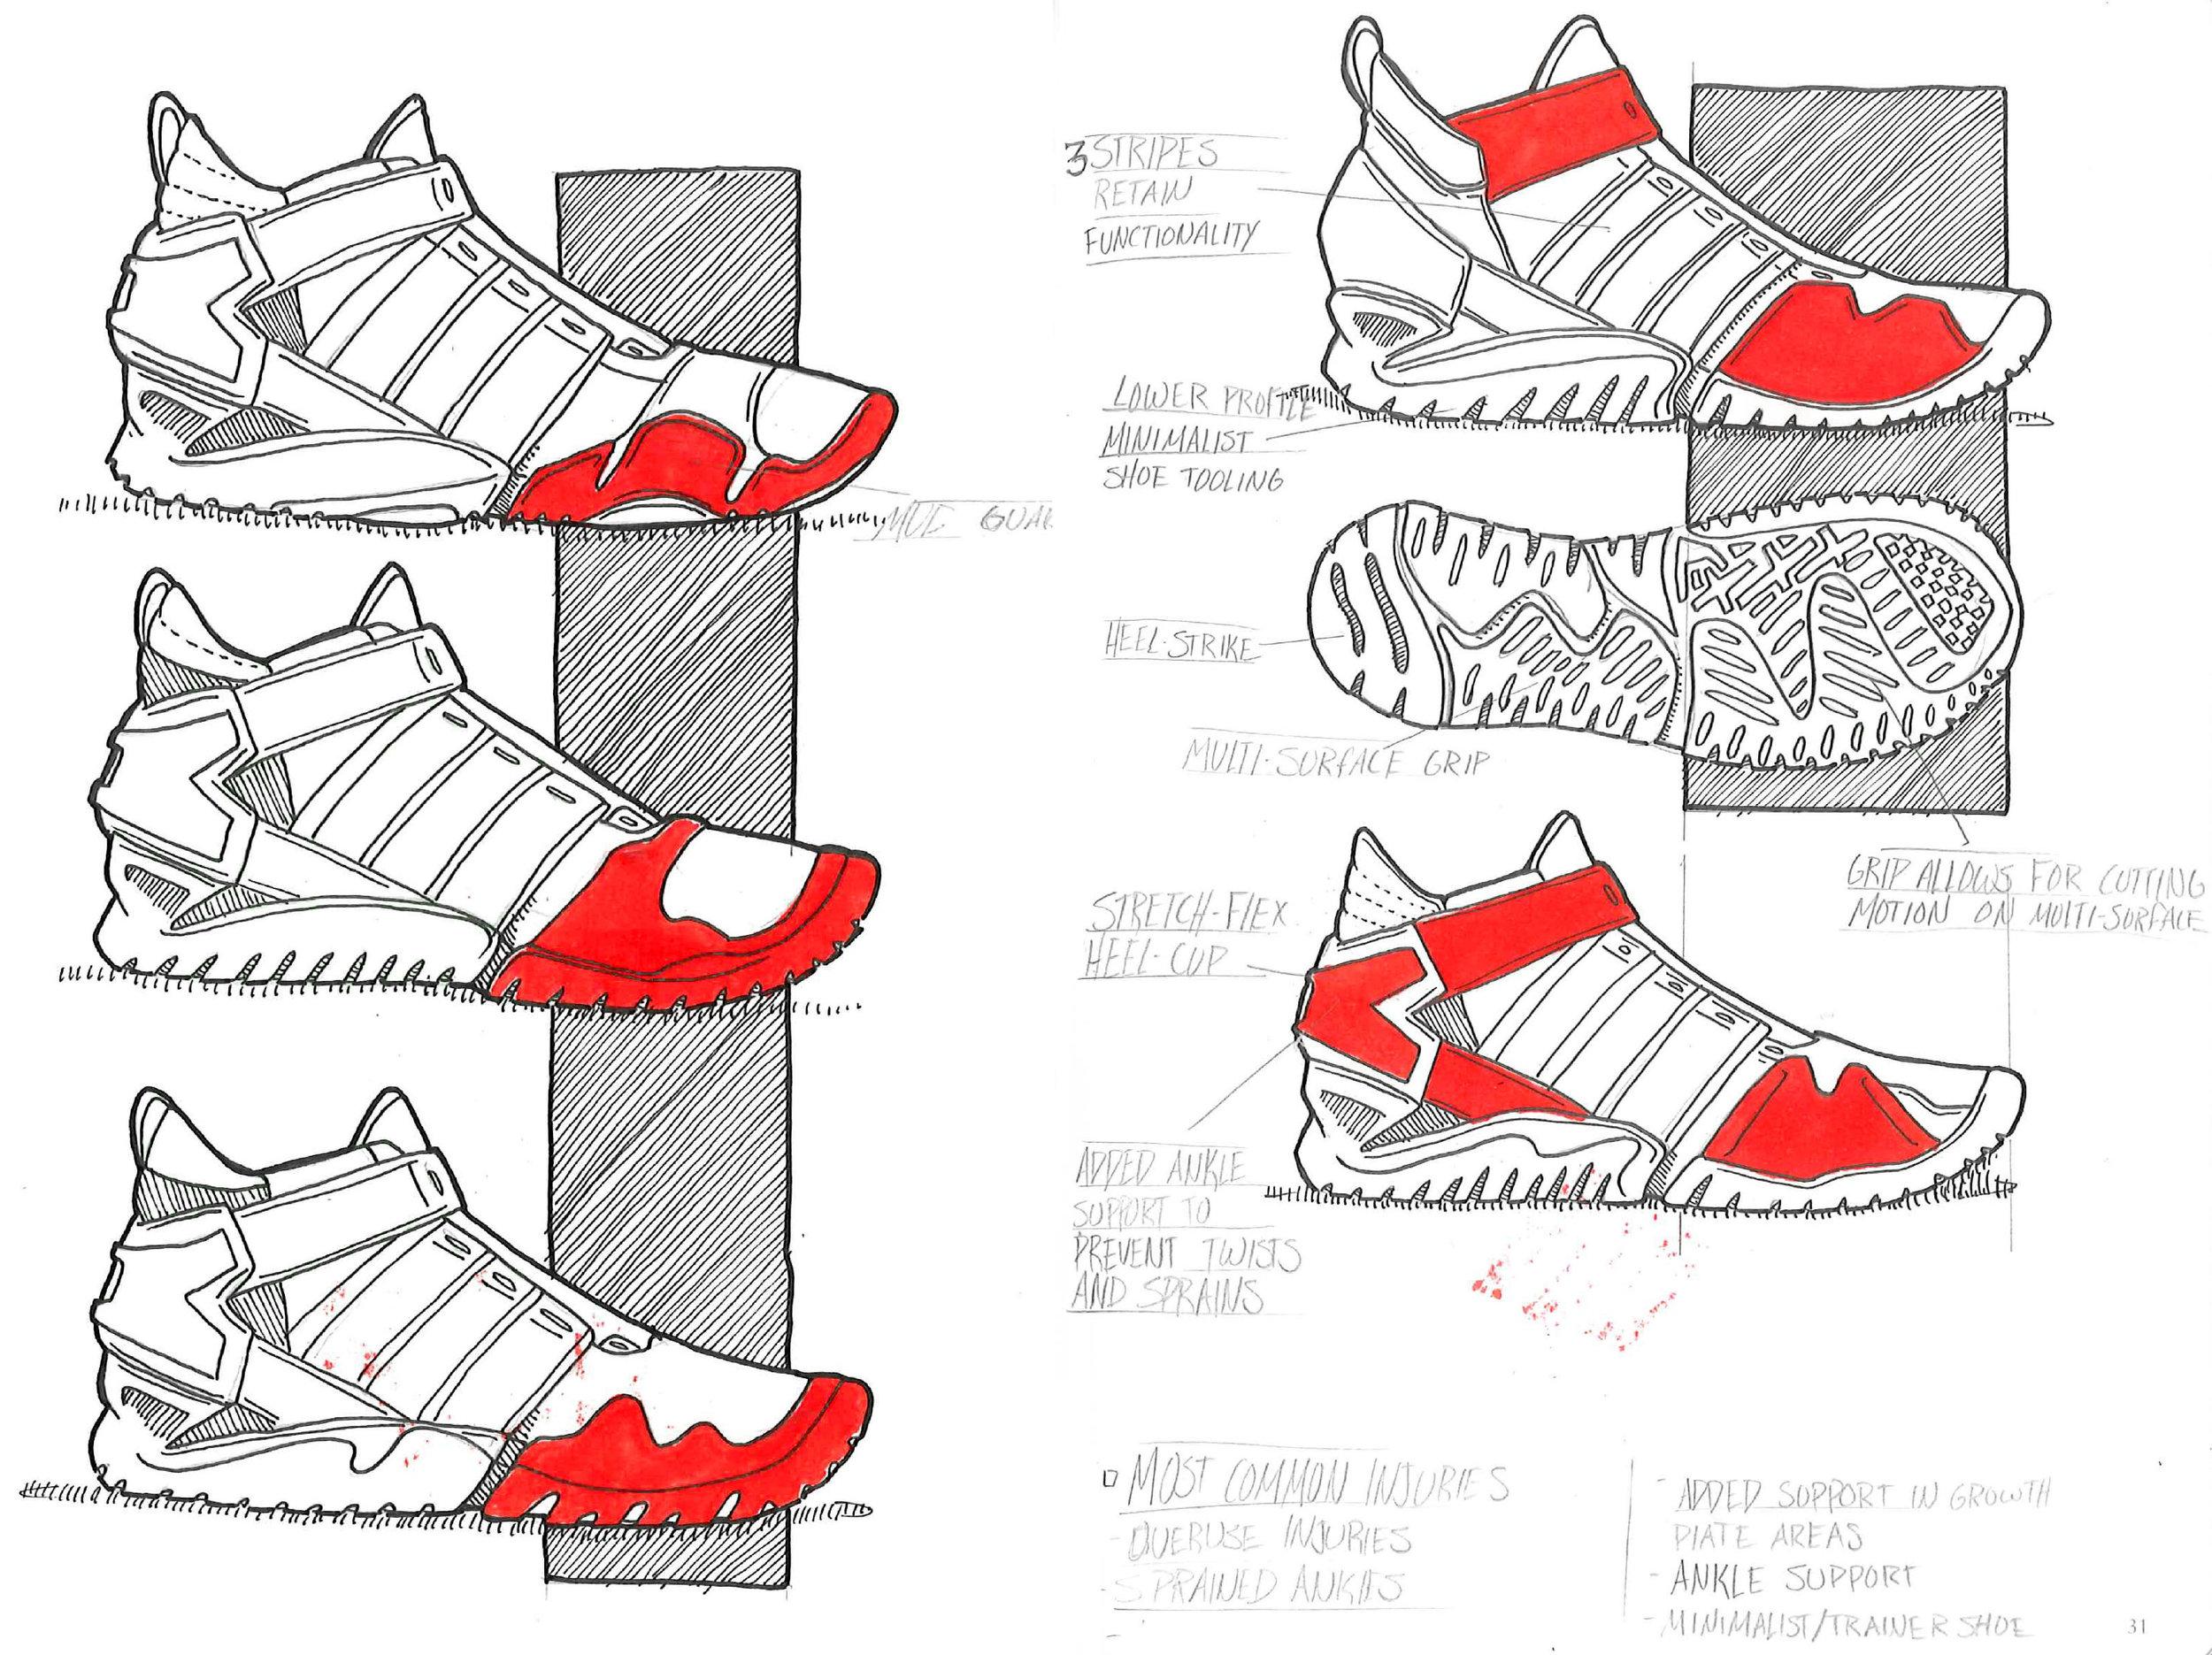 Mckenzie_Sampson_Adidas-87.jpg